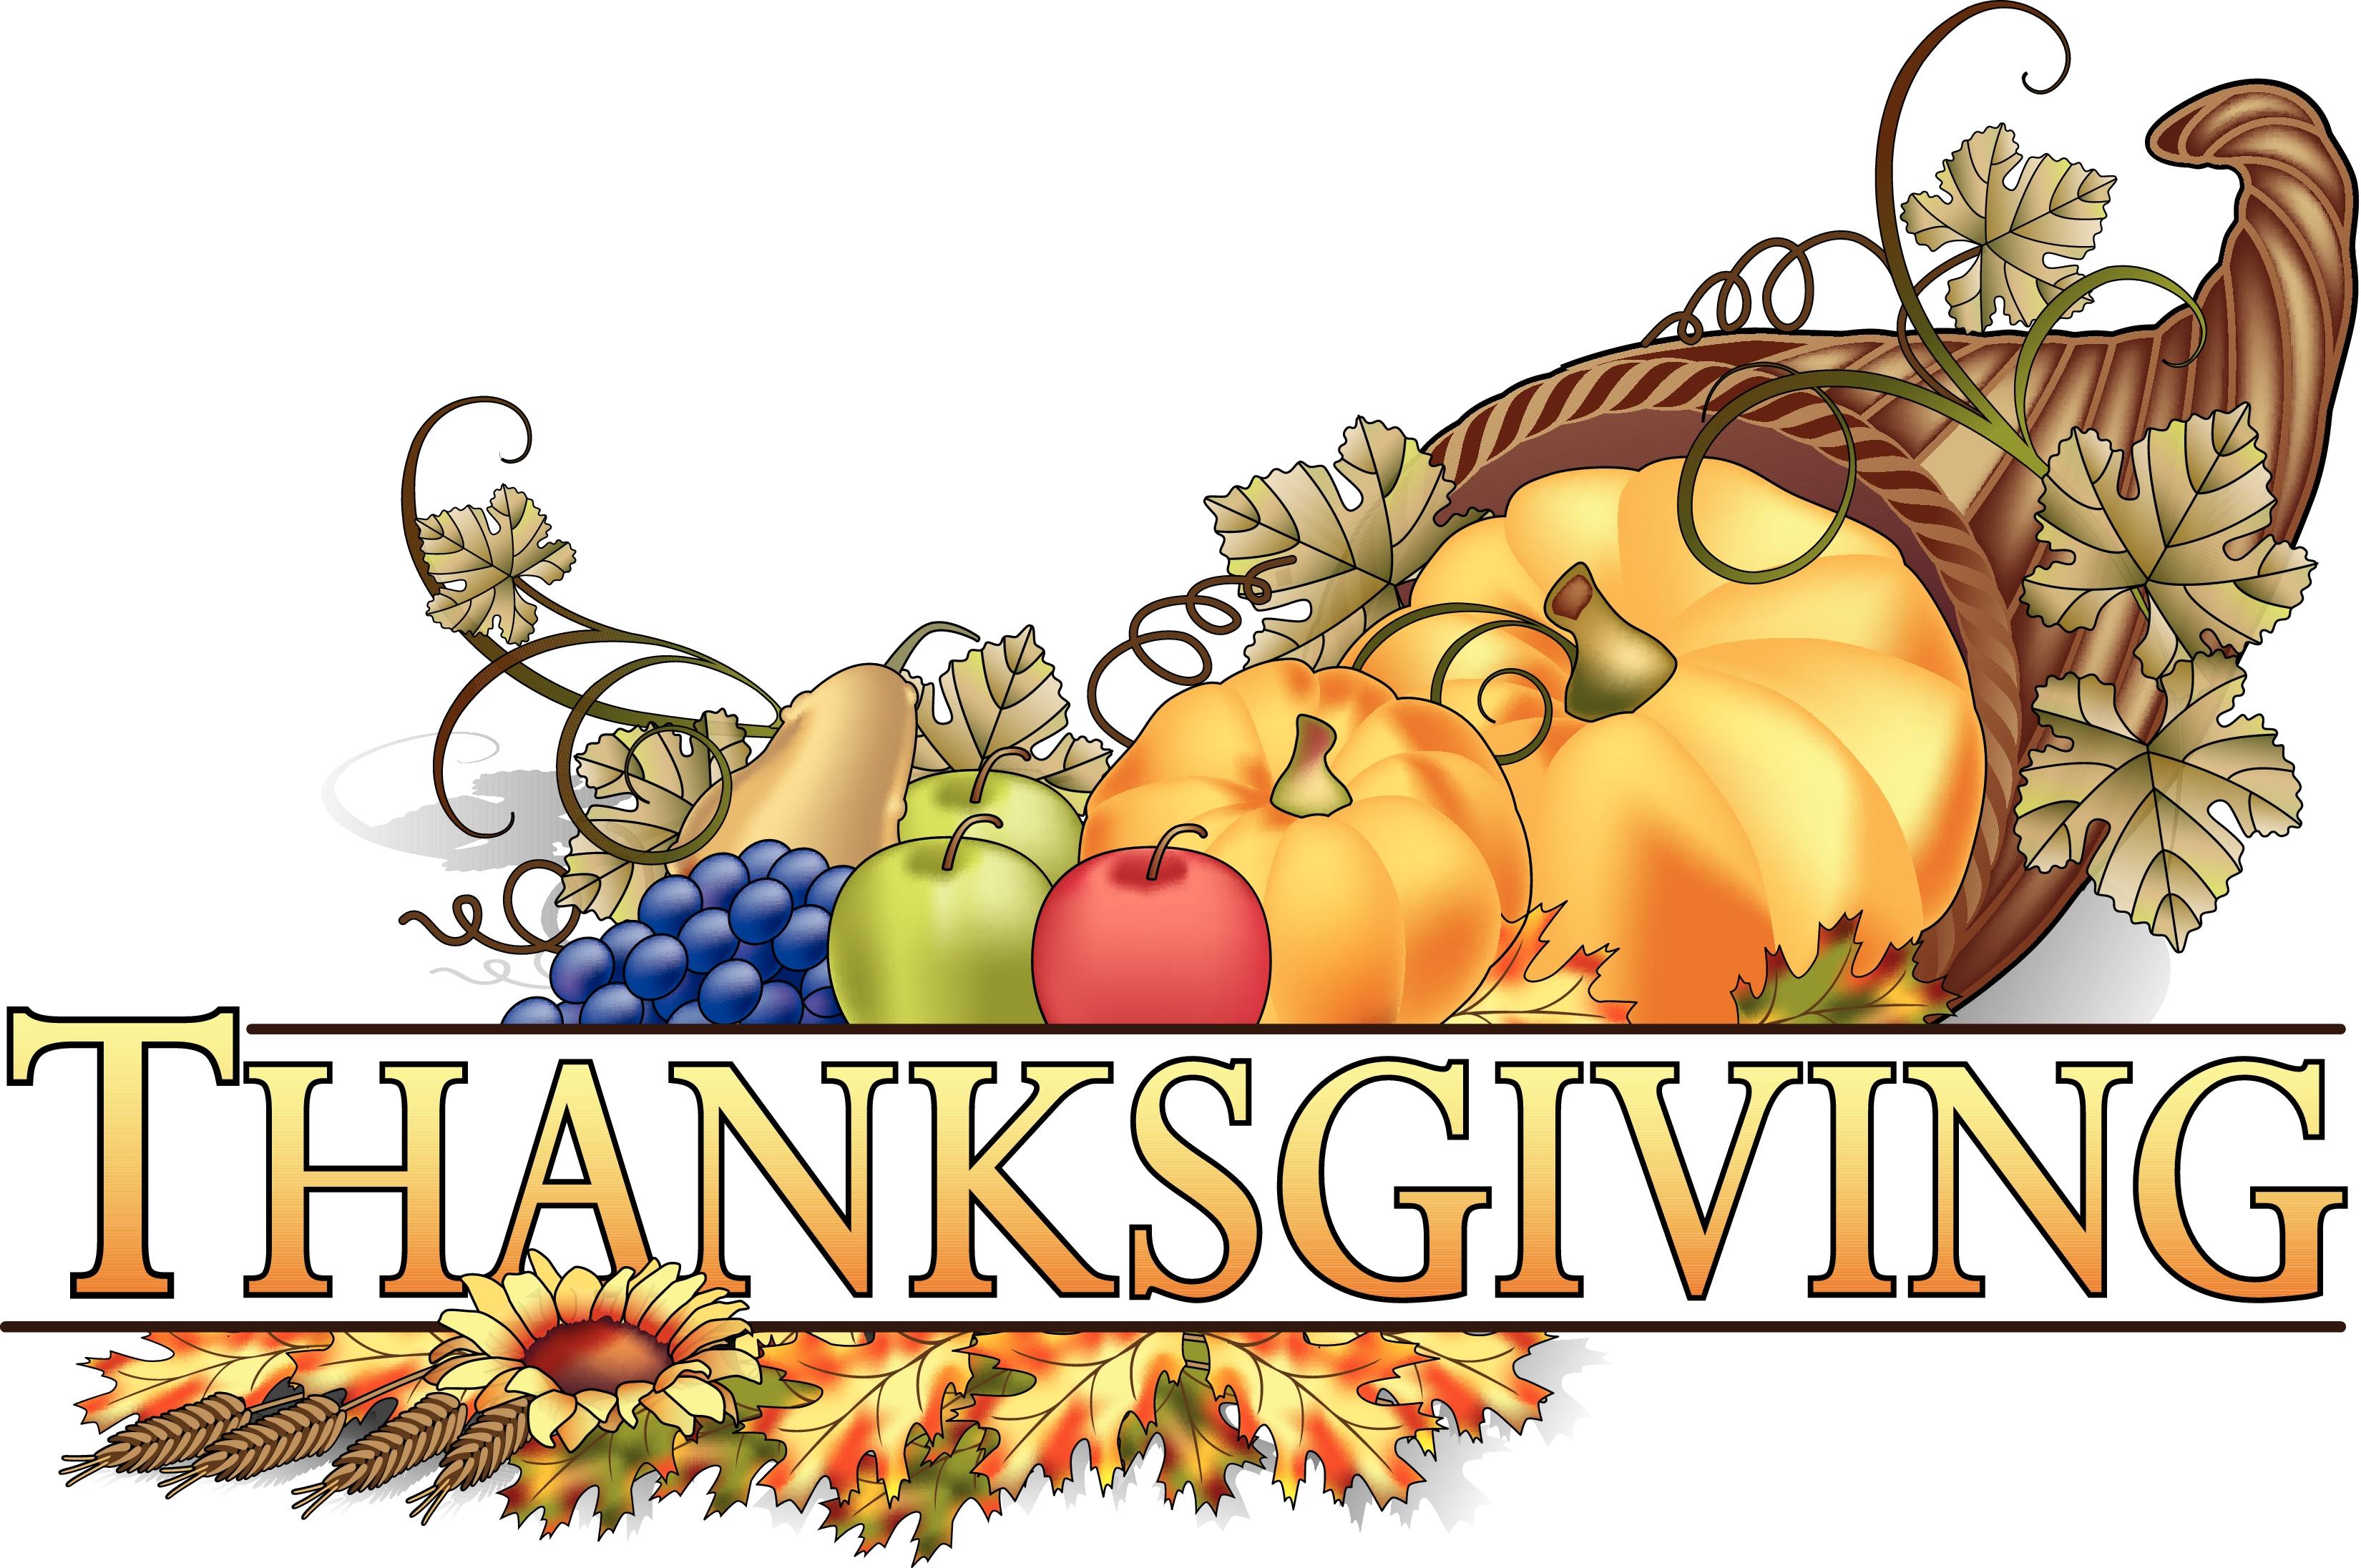 Cornucopia clipart religious Background Thanksgiving Backgrounds Images Thanksgiving